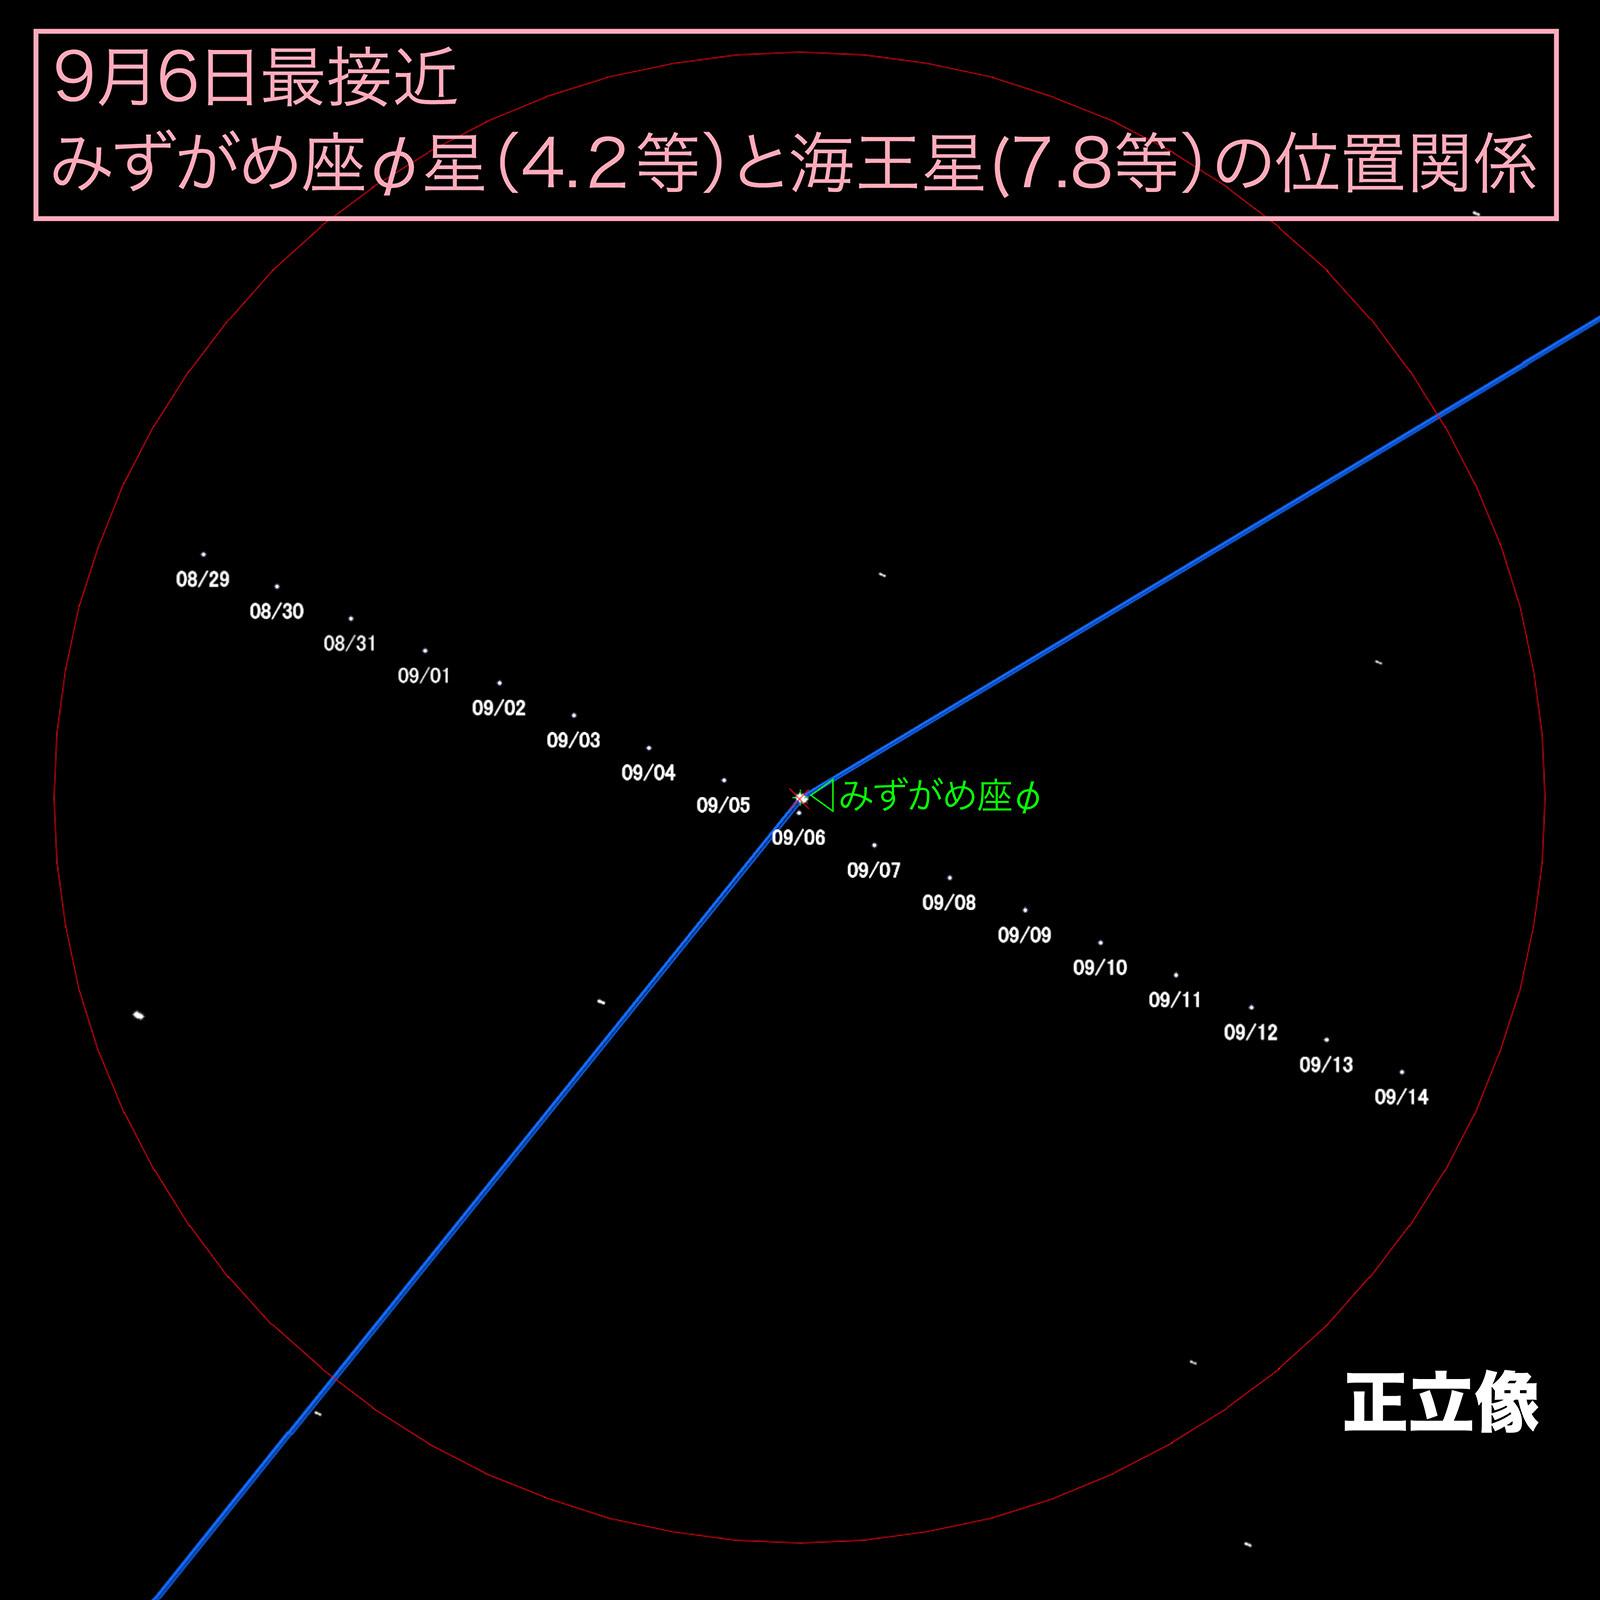 海王星正立像チャート